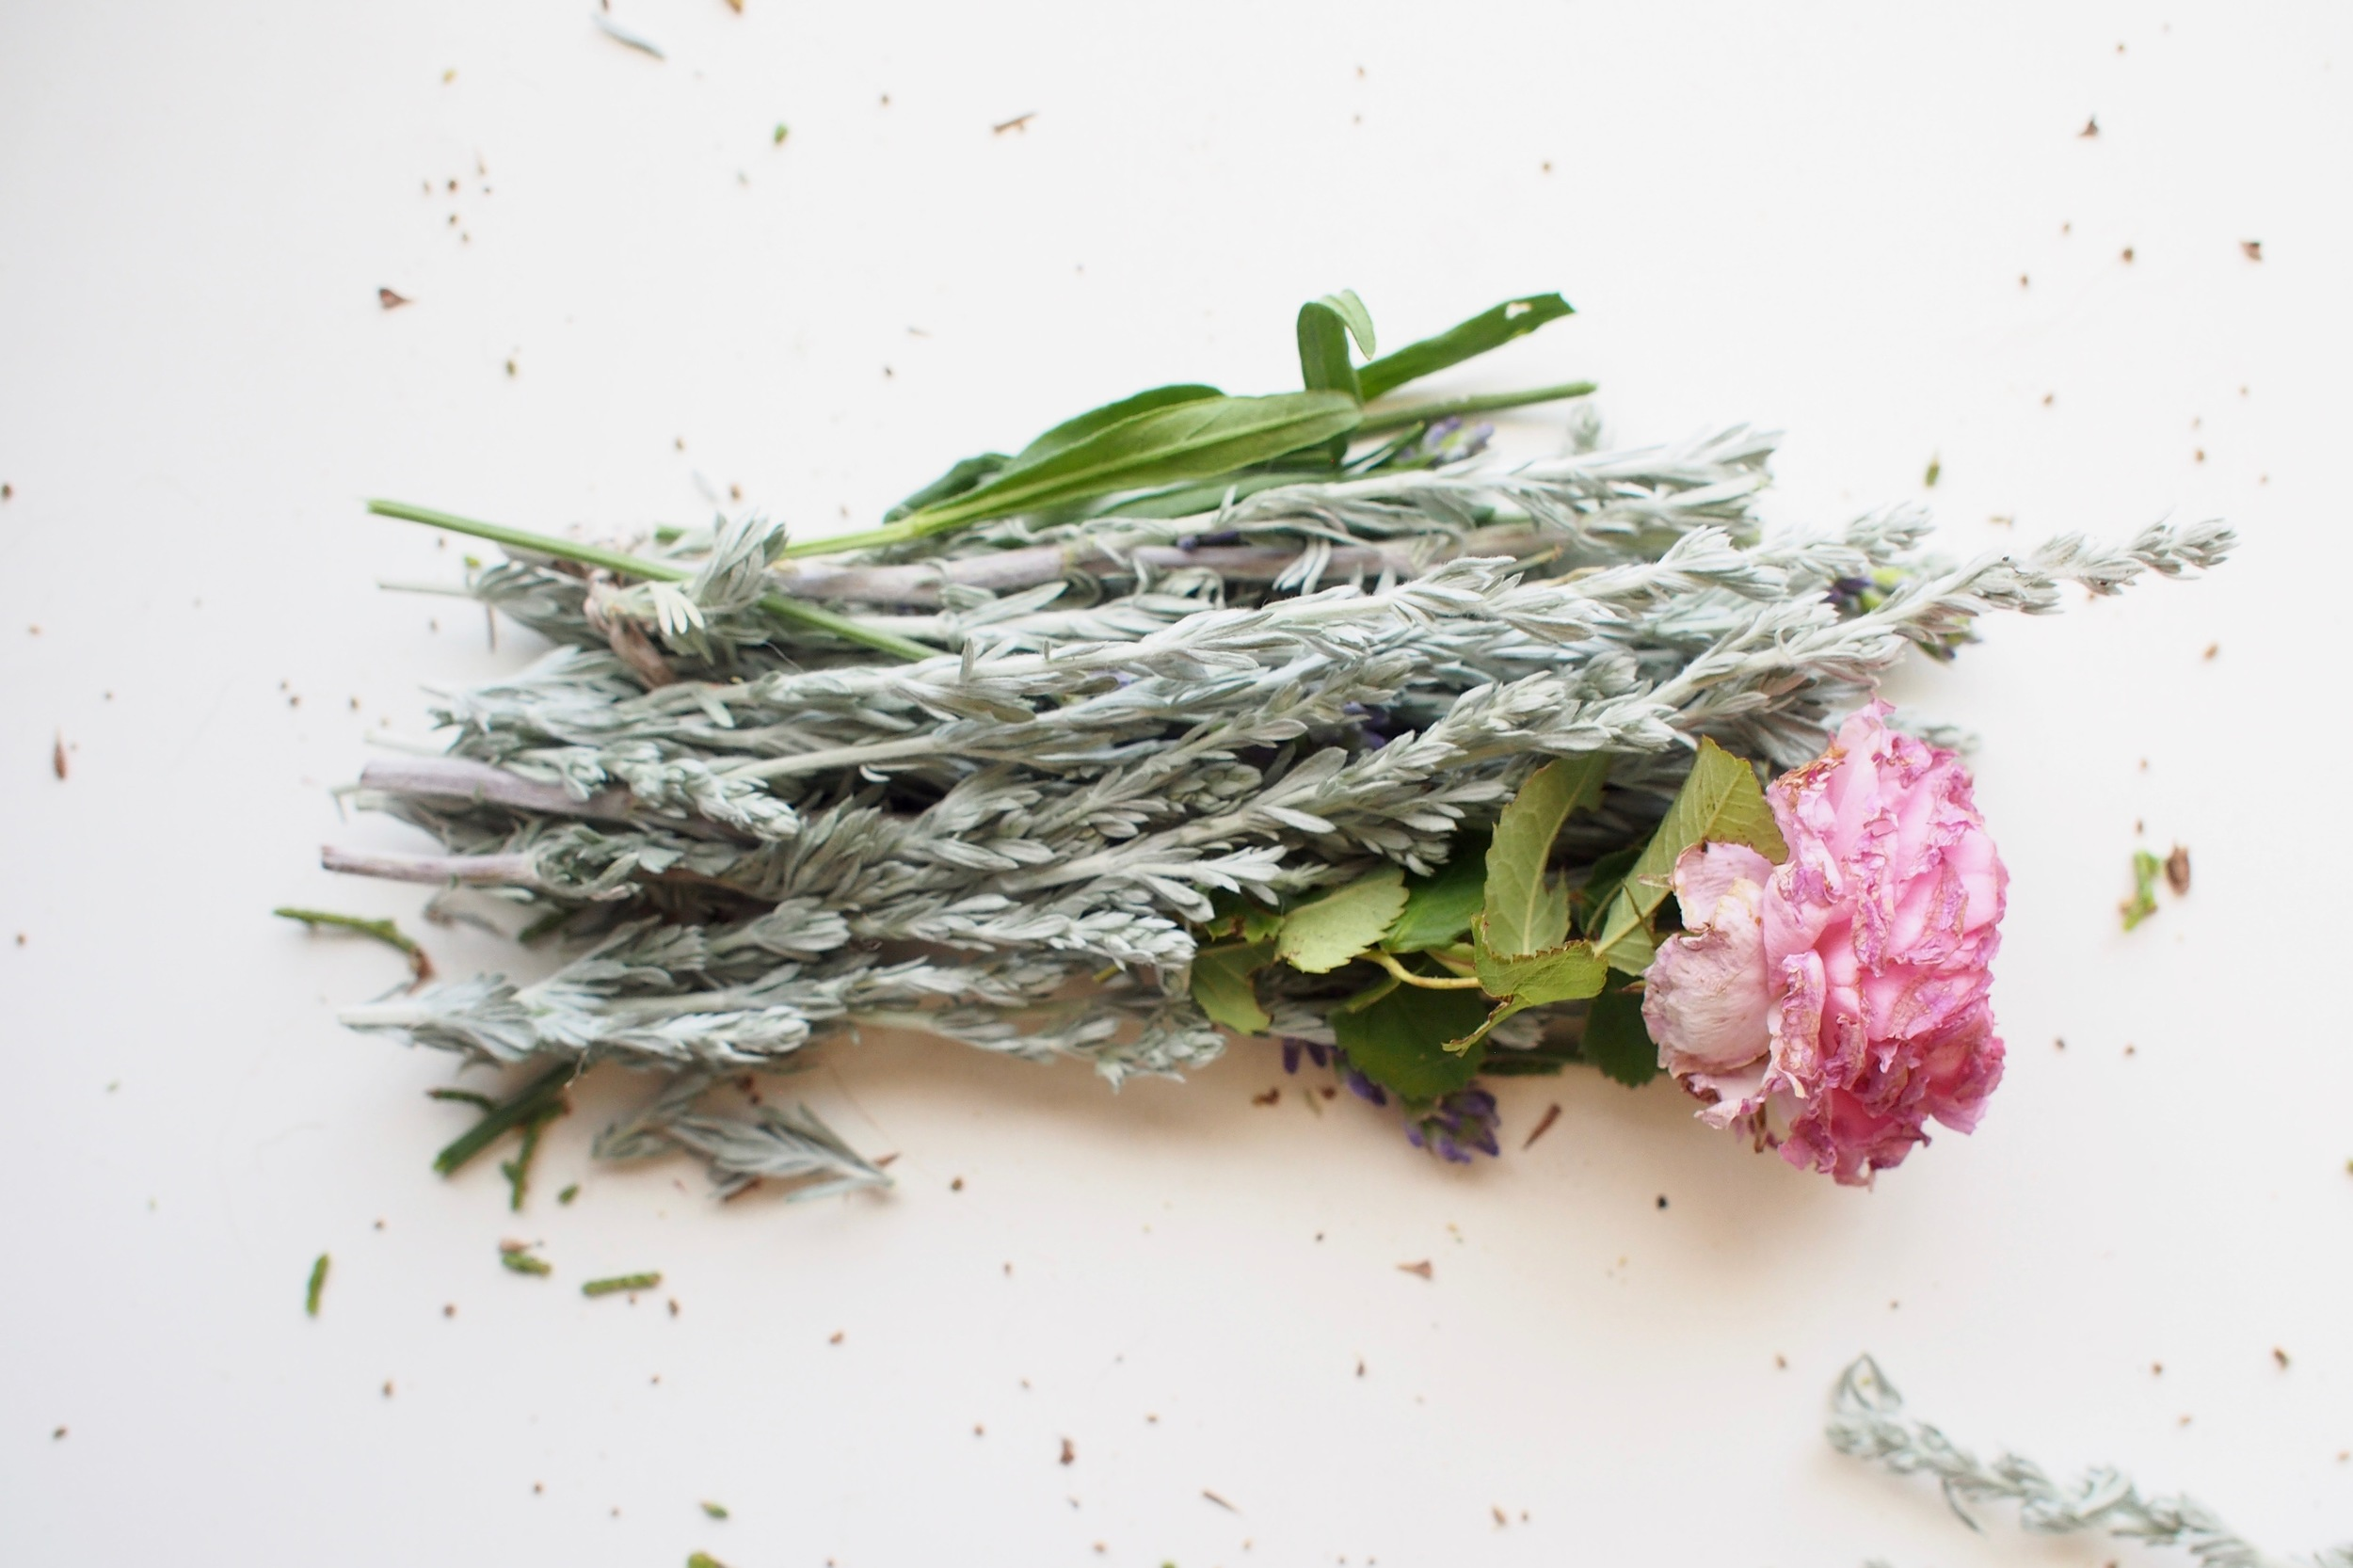 sagebrush, lavender & rose